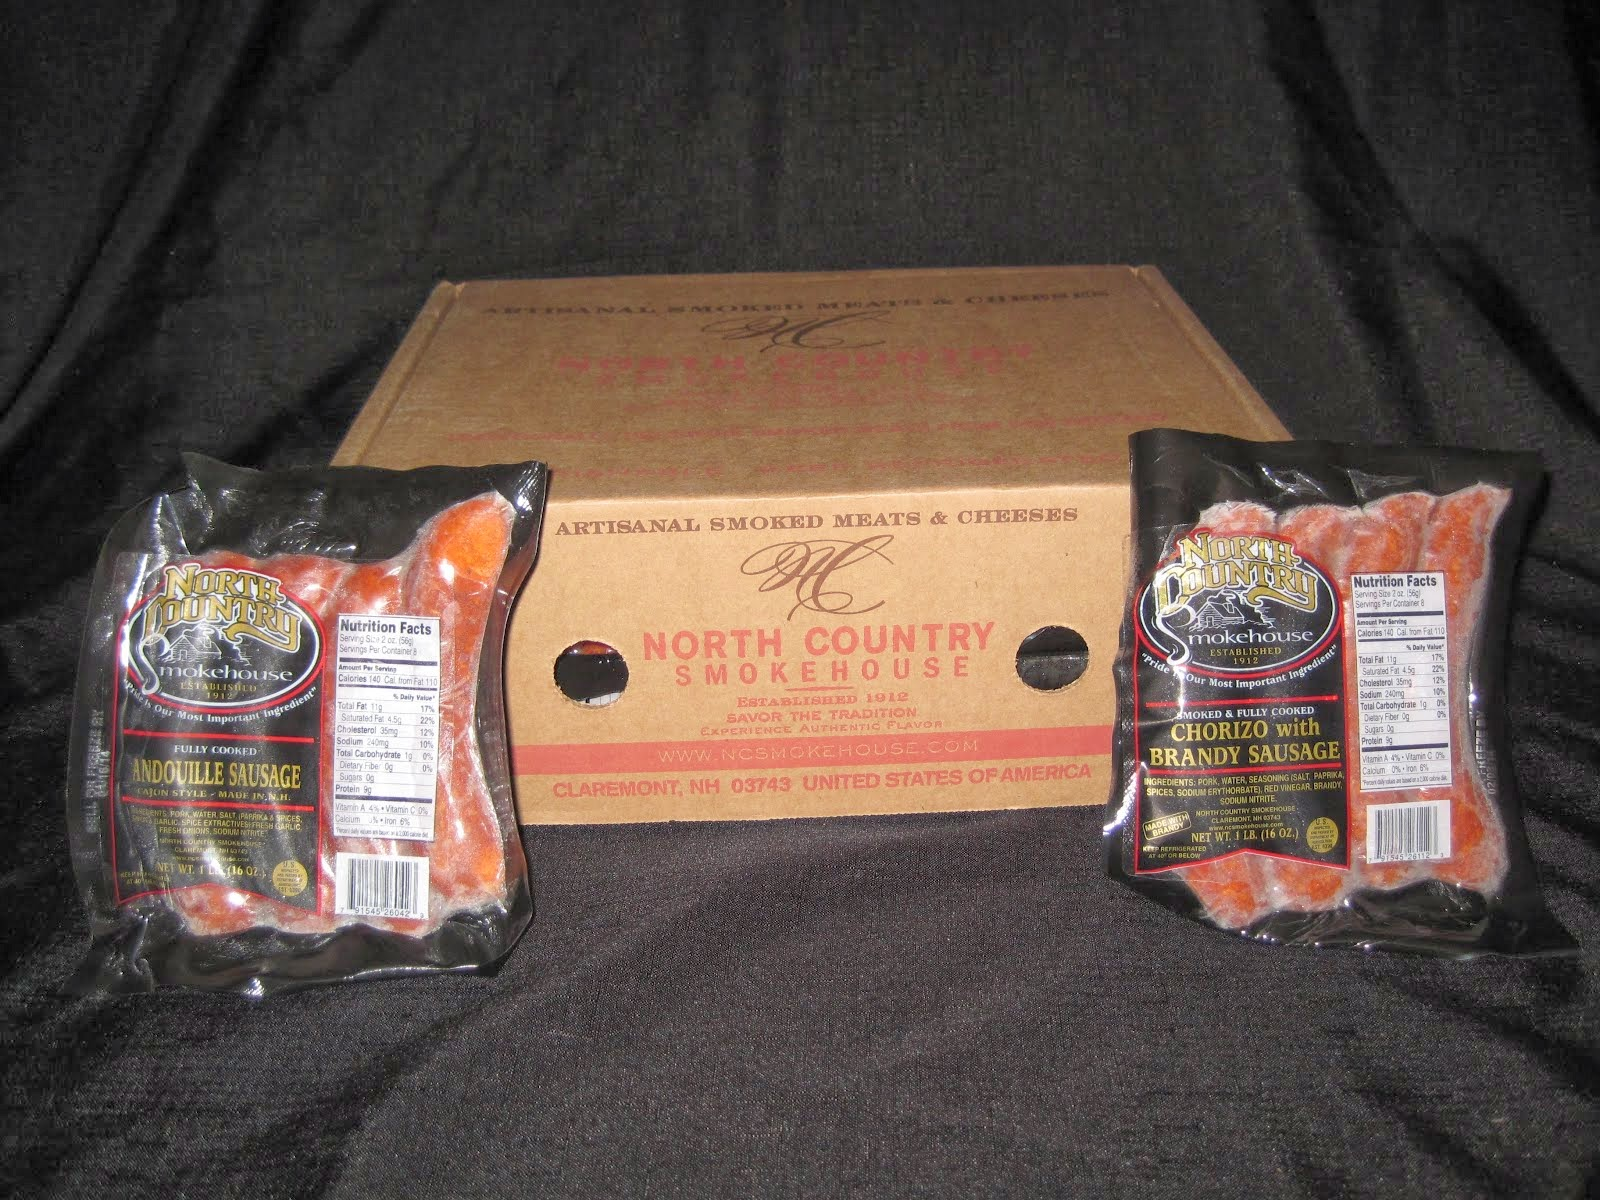 Andouille & Chorizo Sausage 10/1 lb - Item # 15980 & 15981 split - 15990 & 15991 split